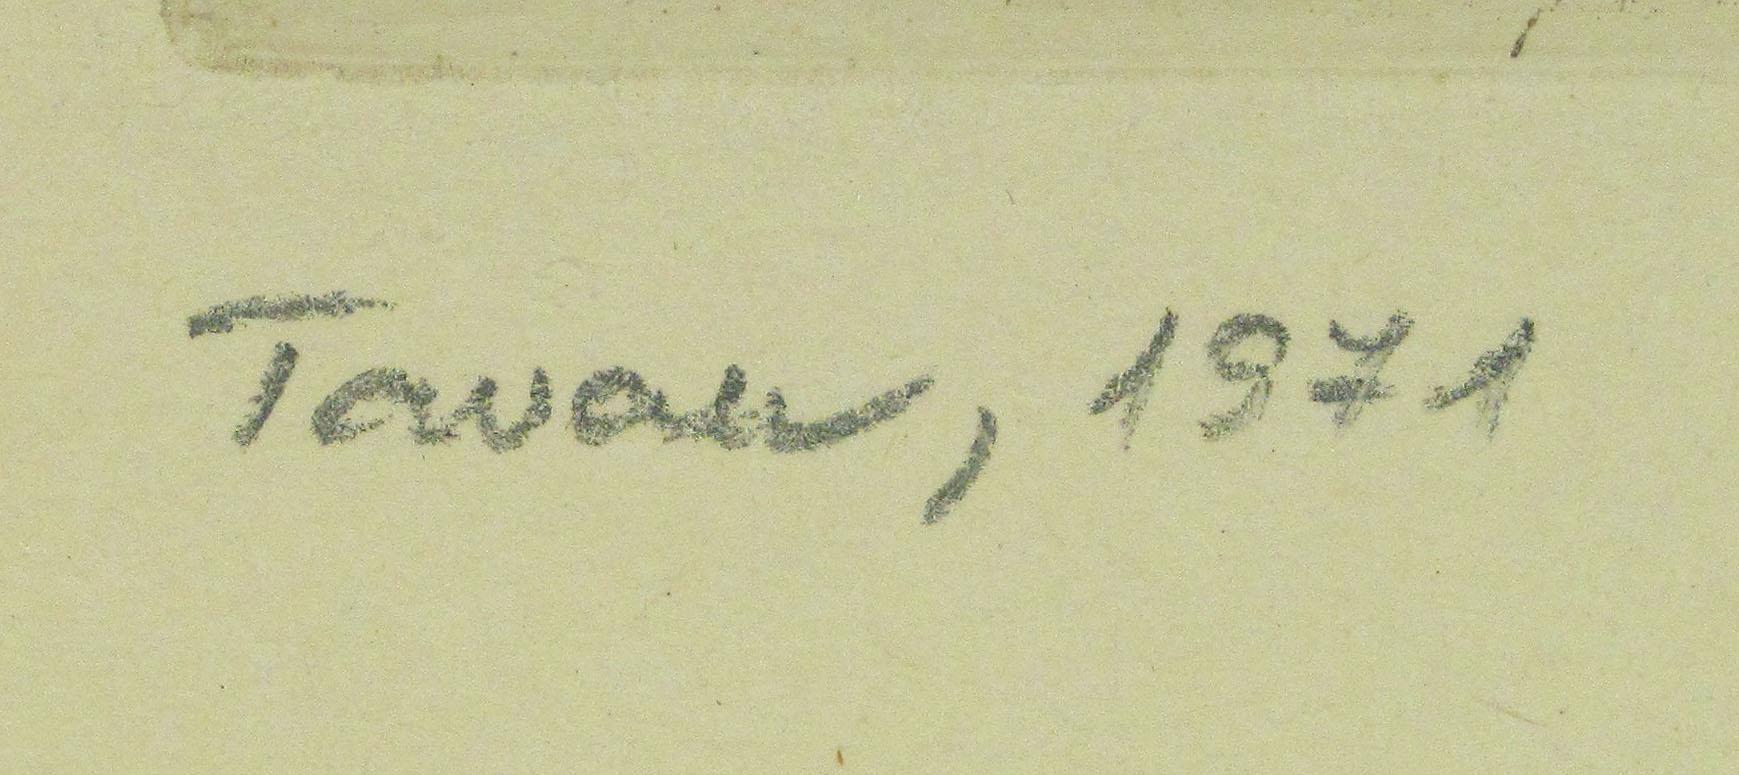 204-9s.jpg (1739�775)